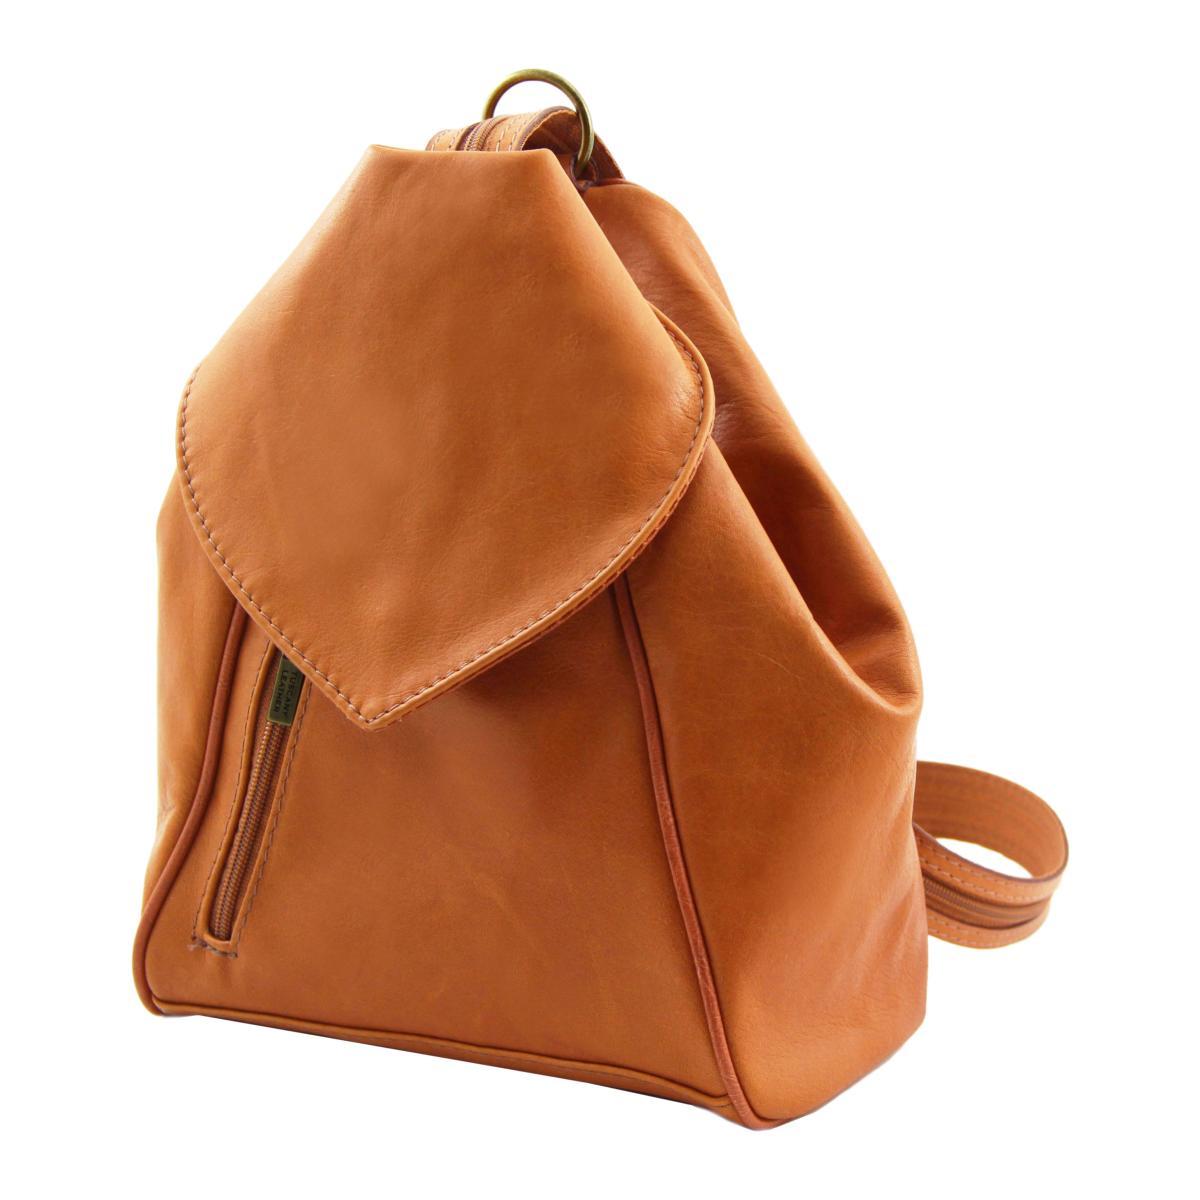 fc074c4450 Sac à Dos Cuir Souple Femme Camel - Tuscany Leather -